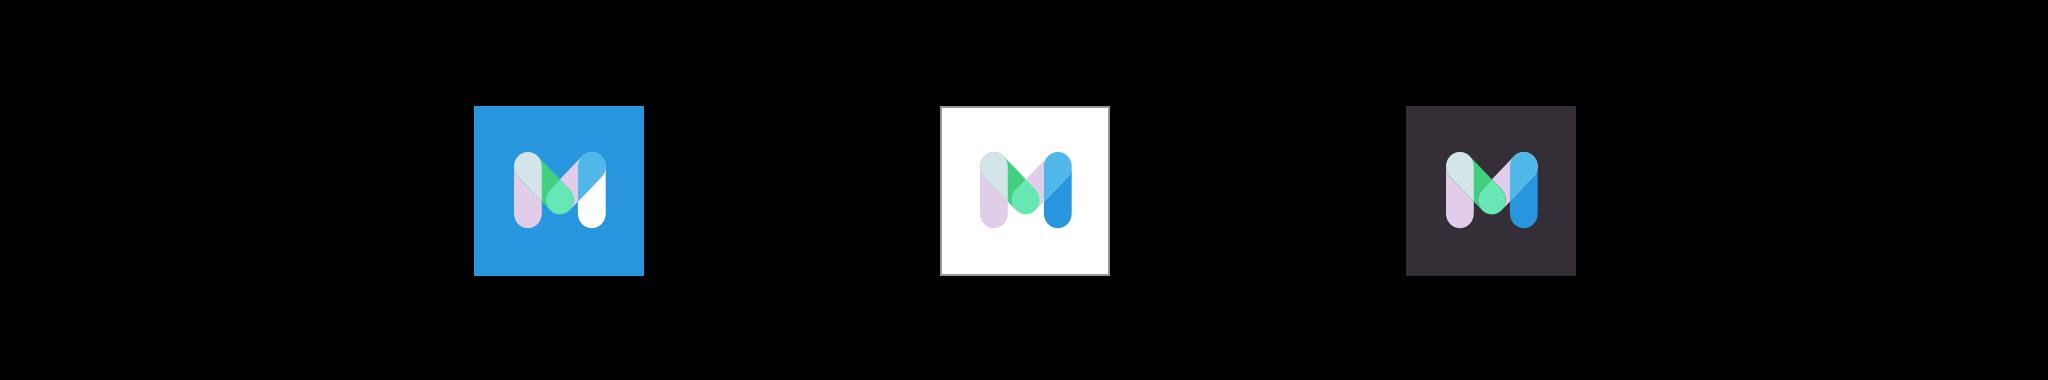 mema-logo-boxes.png